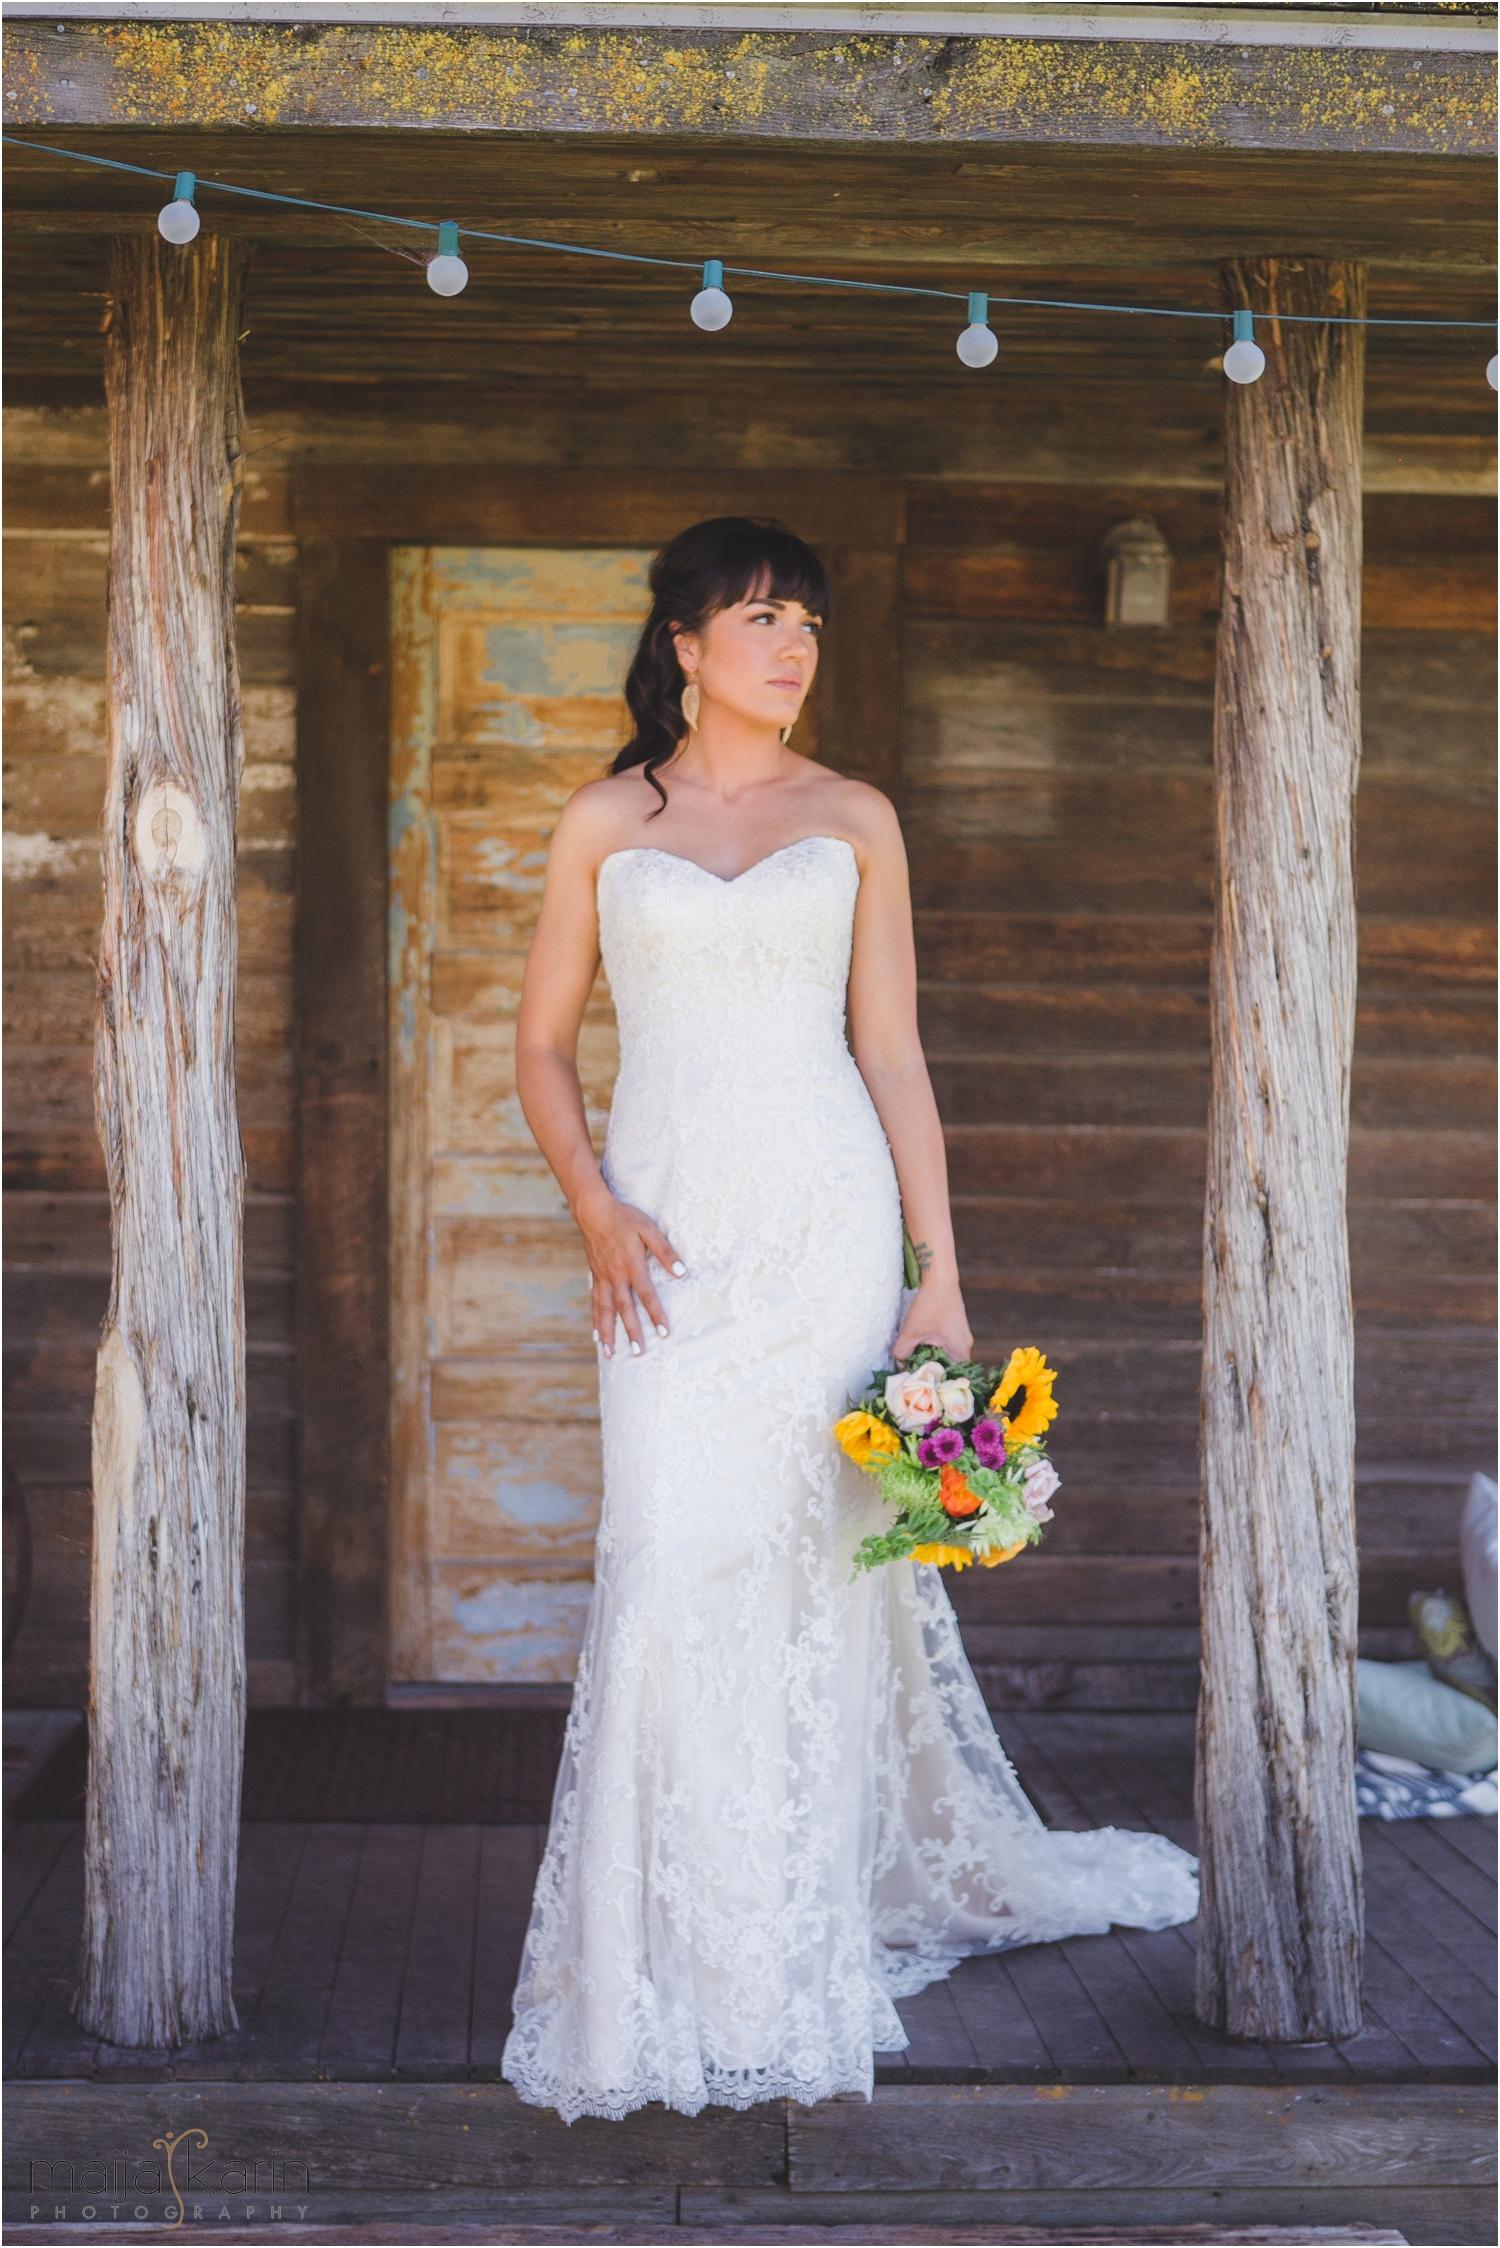 Still-Water-Hollow-Wedding-Maija-Karin-Photography_0012.jpg